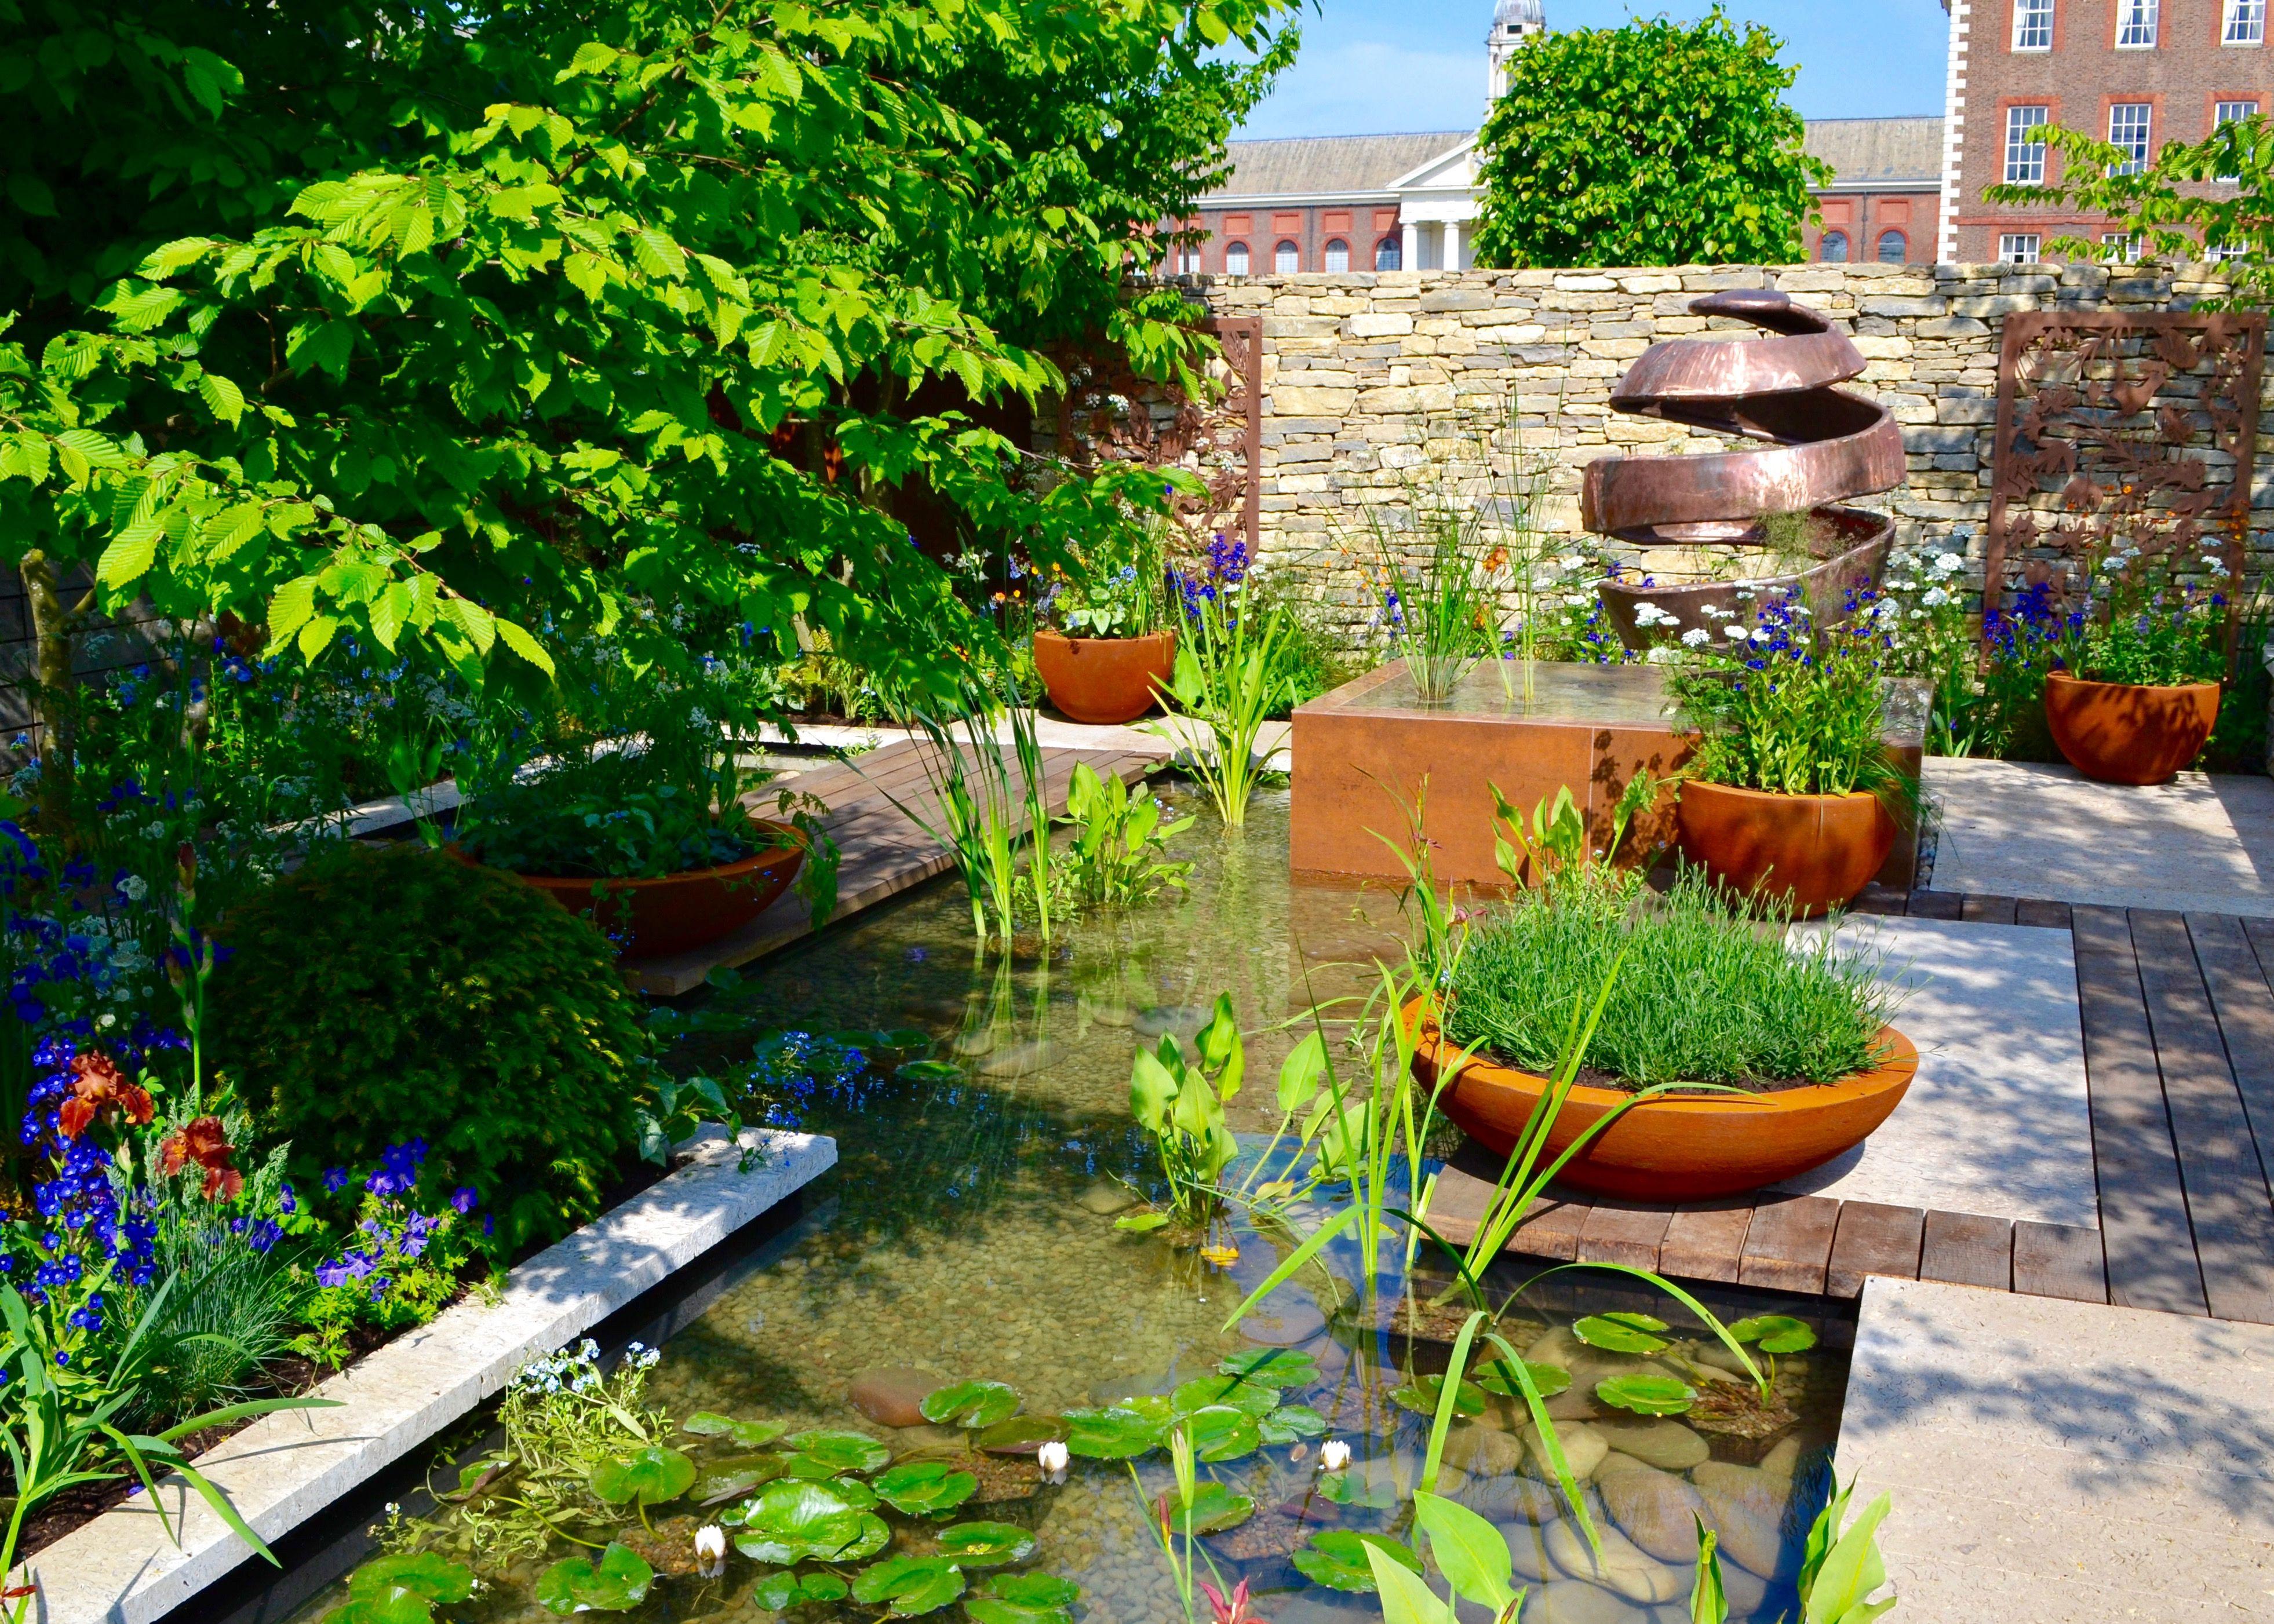 The Silent Pool Gin Garden, winner of a SilverGilt Medal